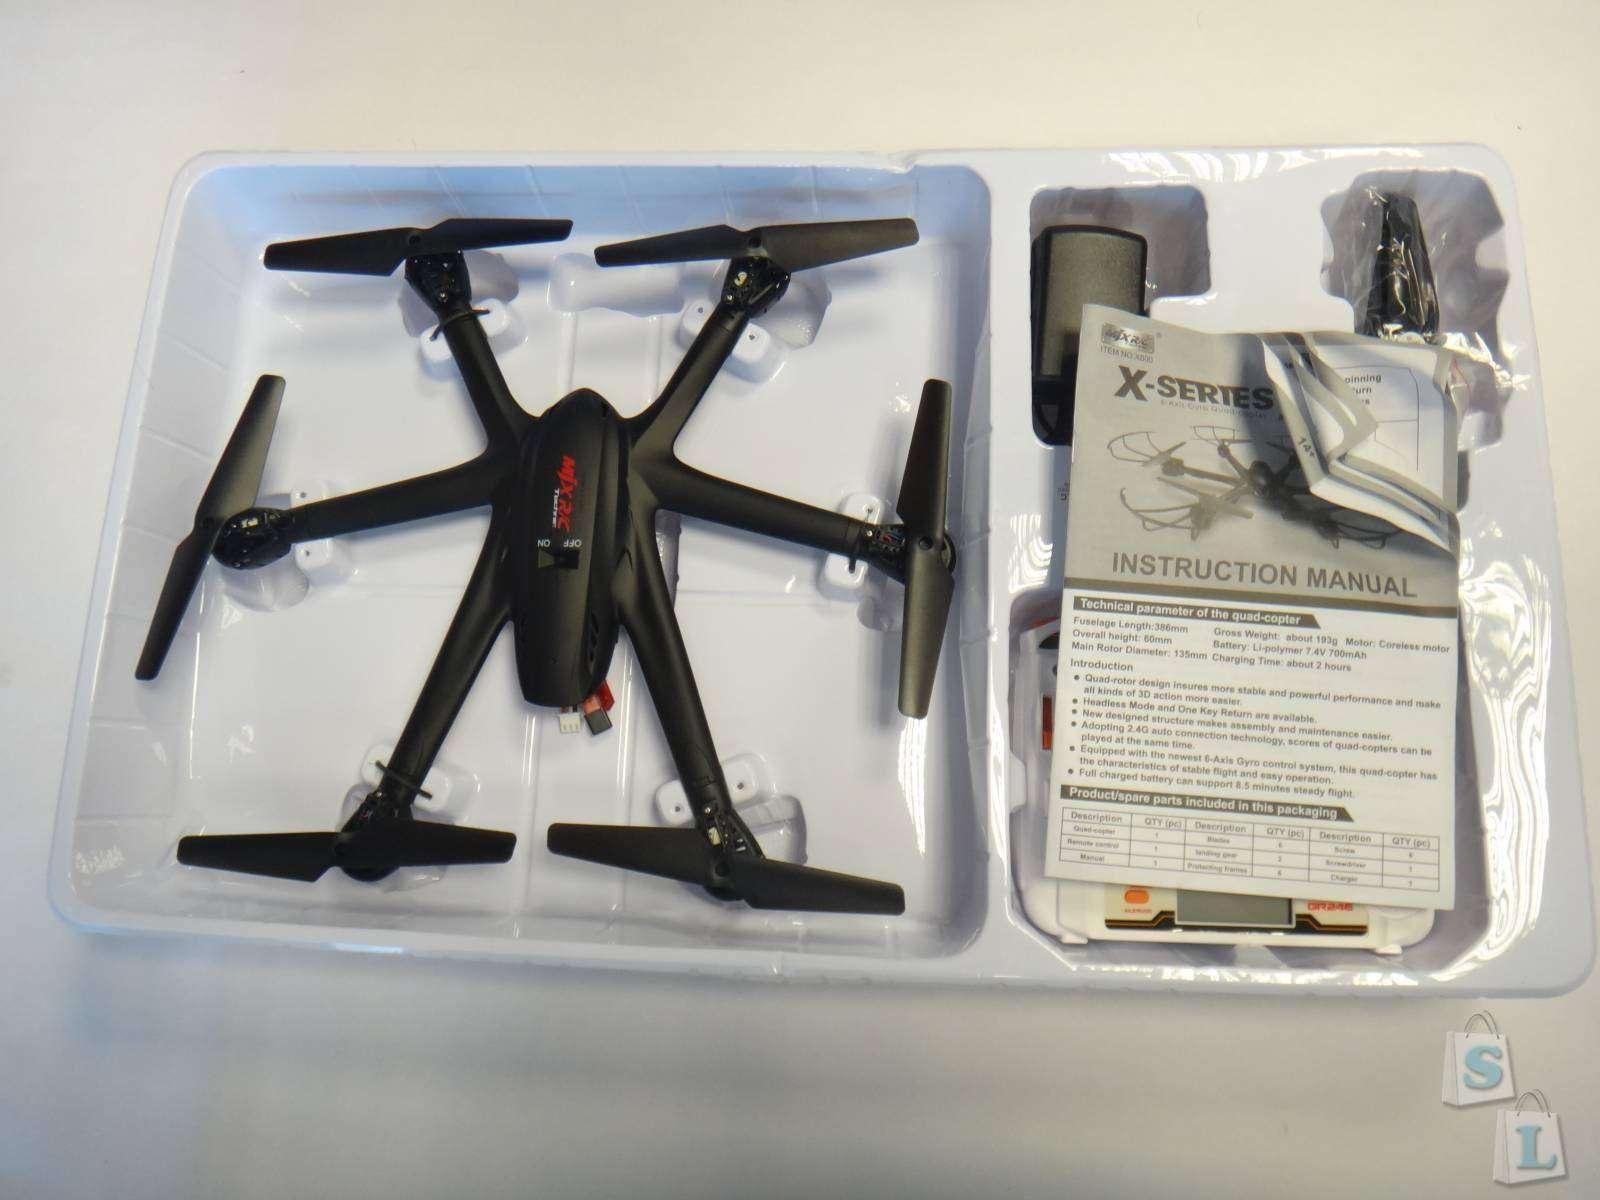 Lightake: Обзор гексакоптера MJX X600 2.4G 4CH RC Drone Hexacopter 6-axis Gyro